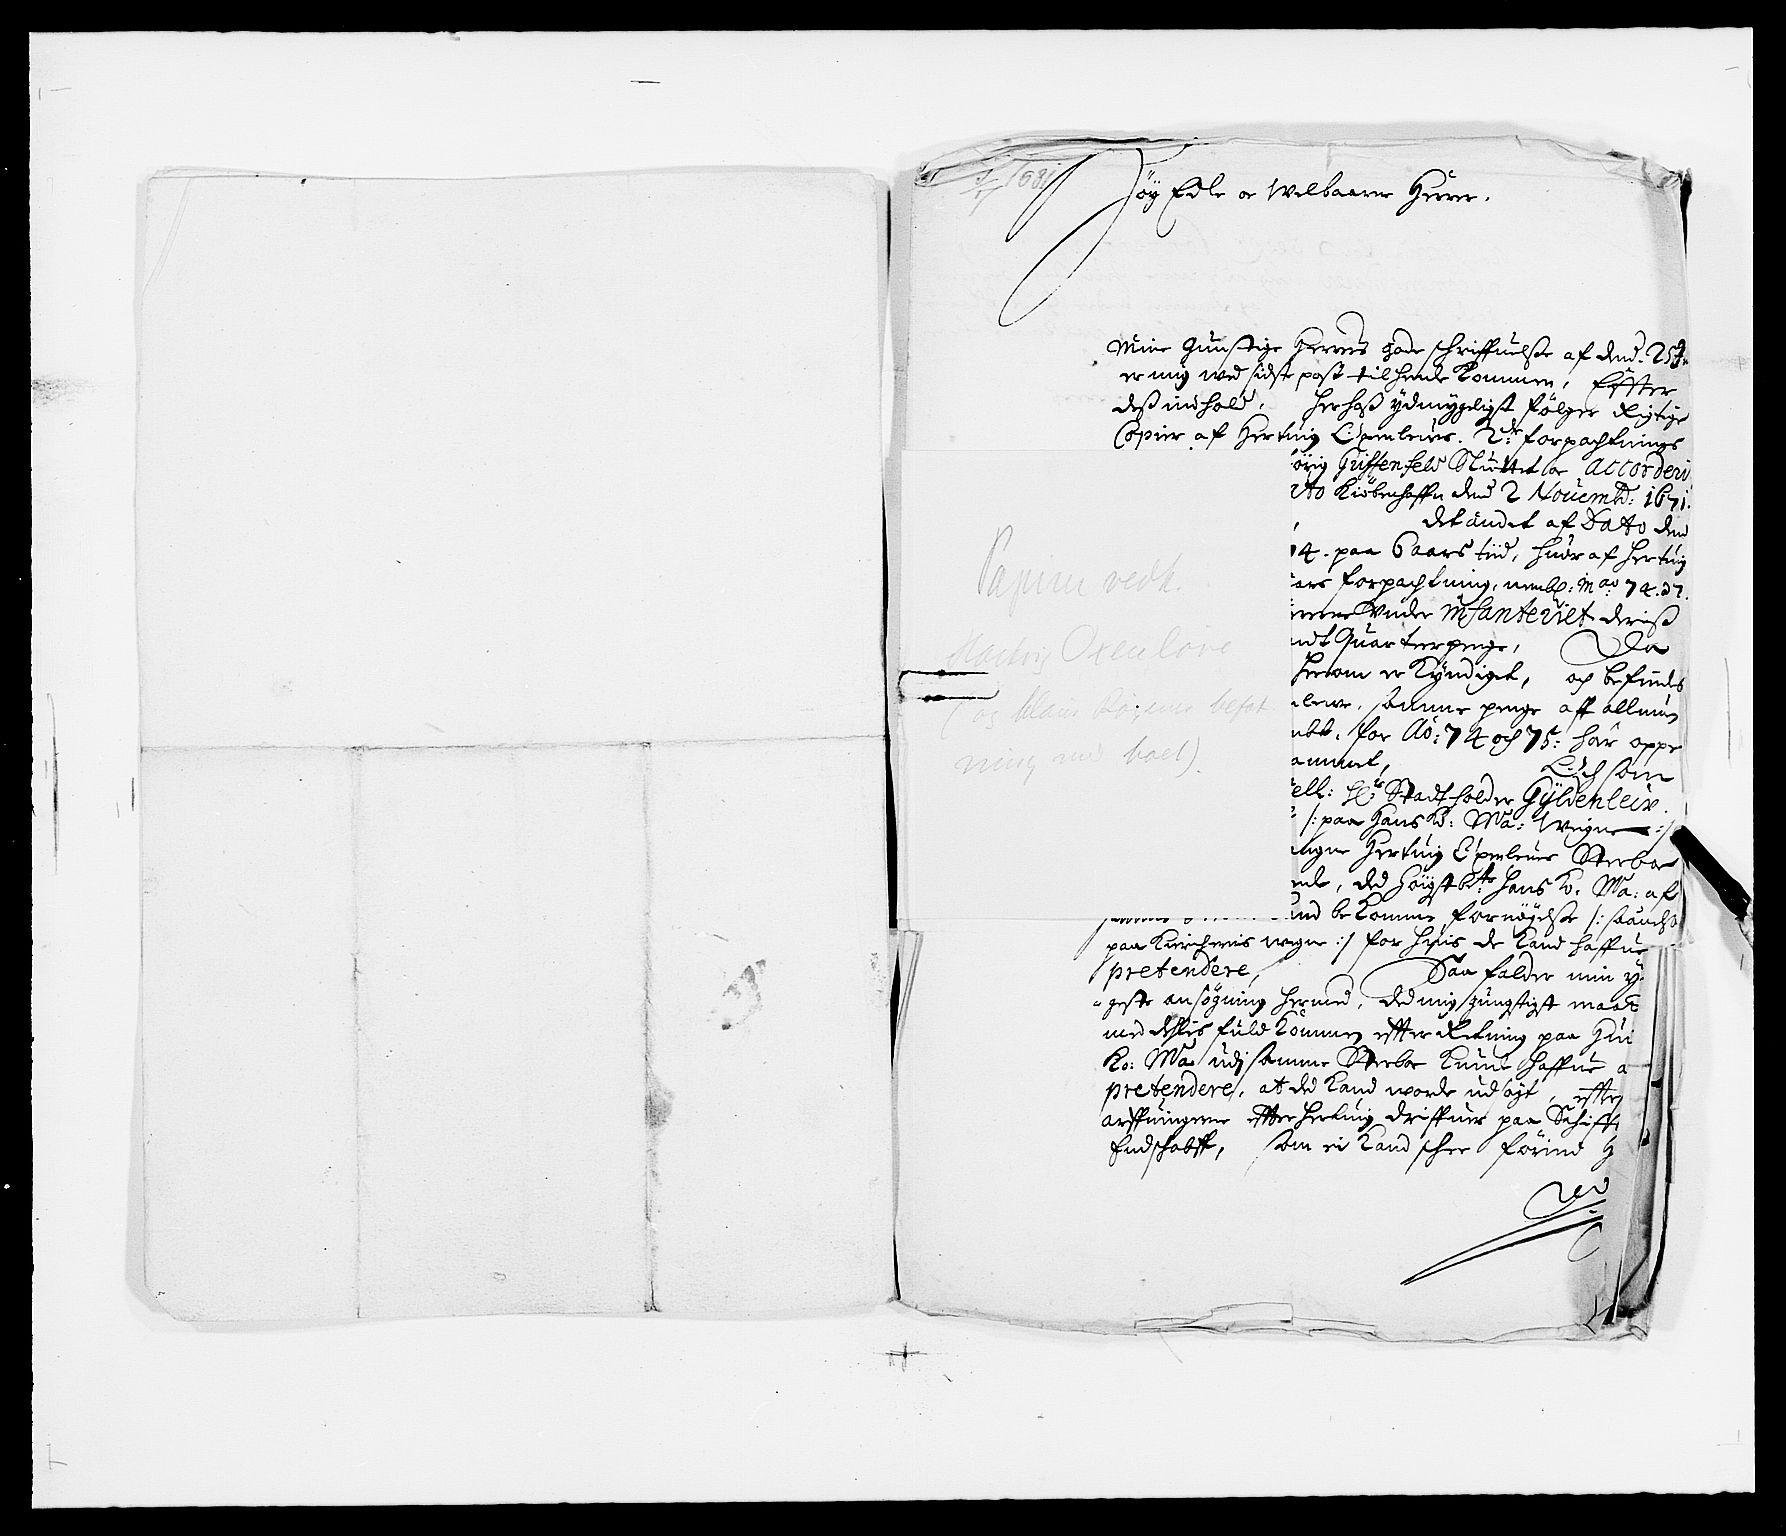 RA, Rentekammeret inntil 1814, Reviderte regnskaper, Fogderegnskap, R32/L1845: Fogderegnskap Jarlsberg grevskap, 1676-1678, s. 493